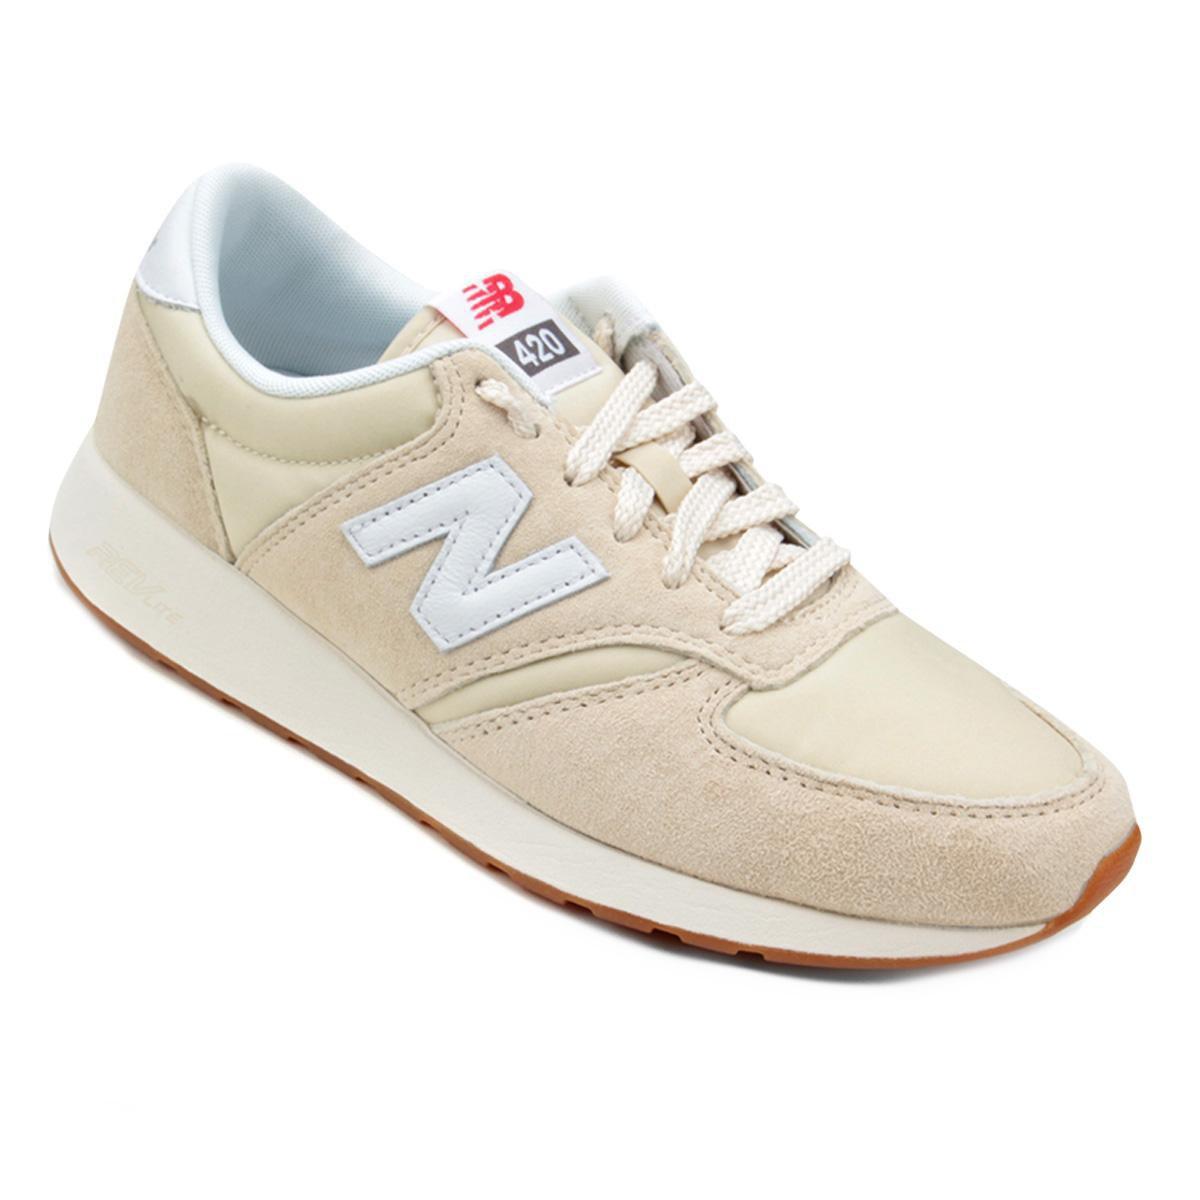 4516e86504f Tênis Couro New Balance 420 Feminino. undefined